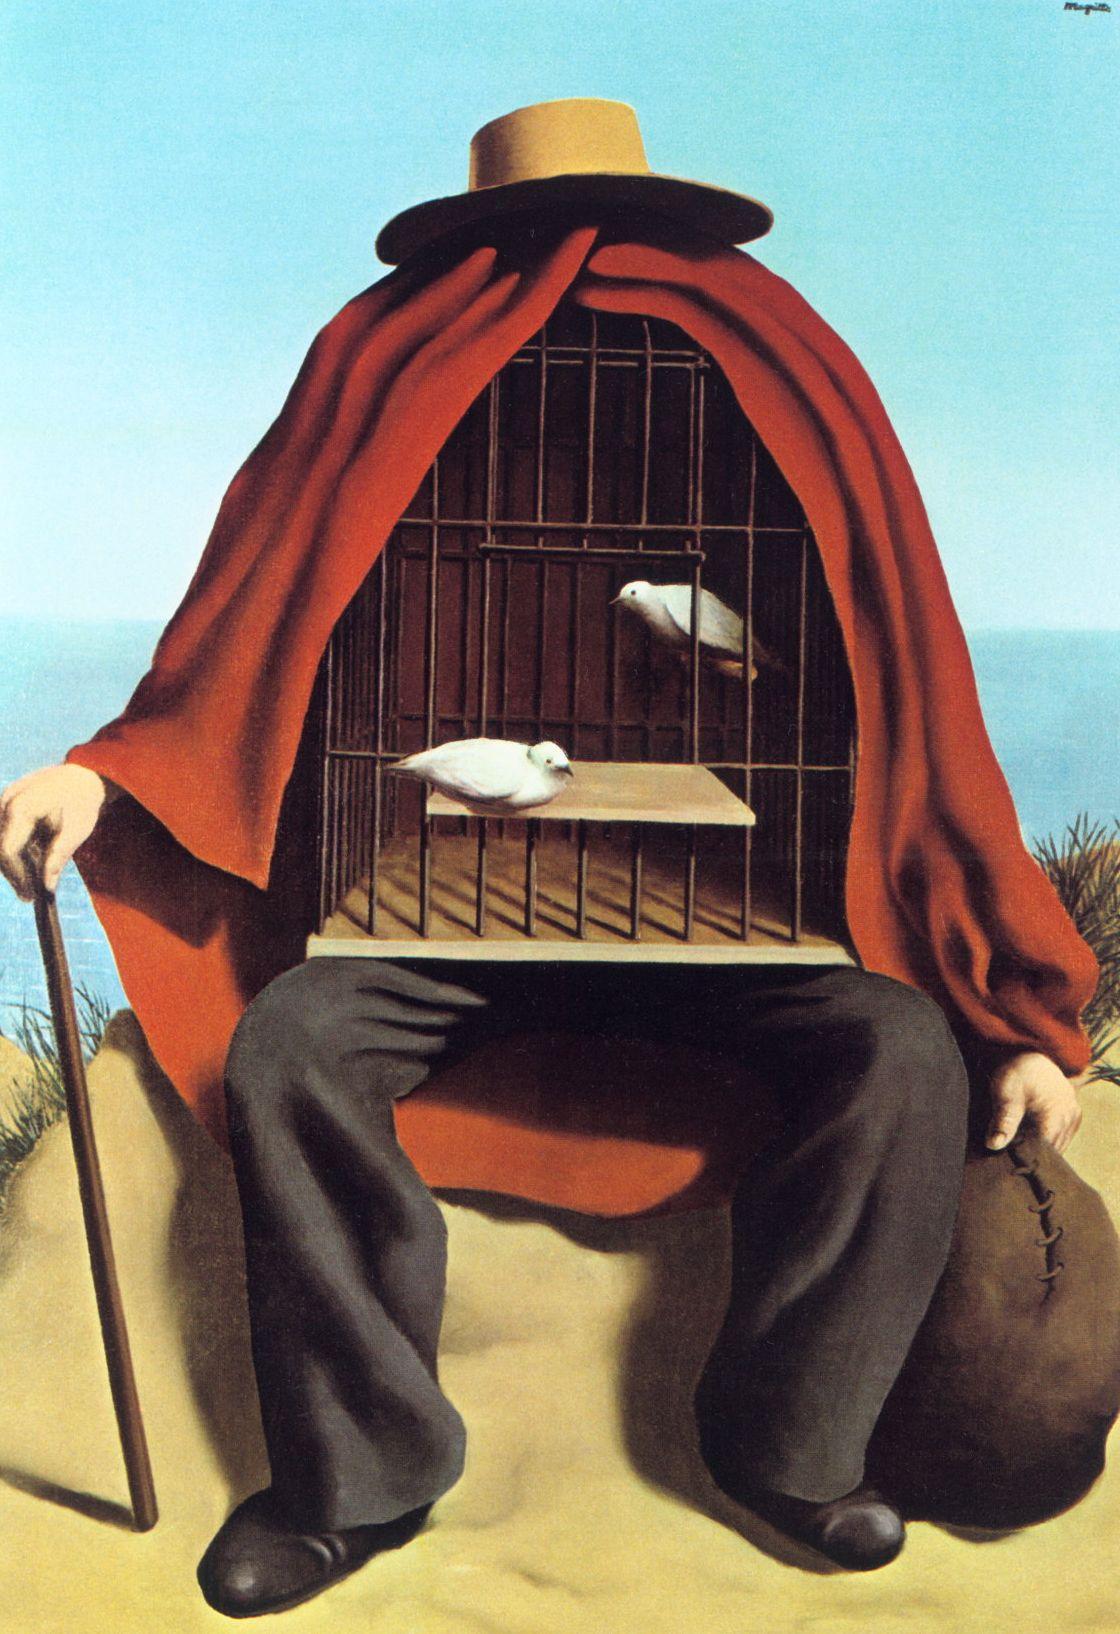 René Magritte. Therapist